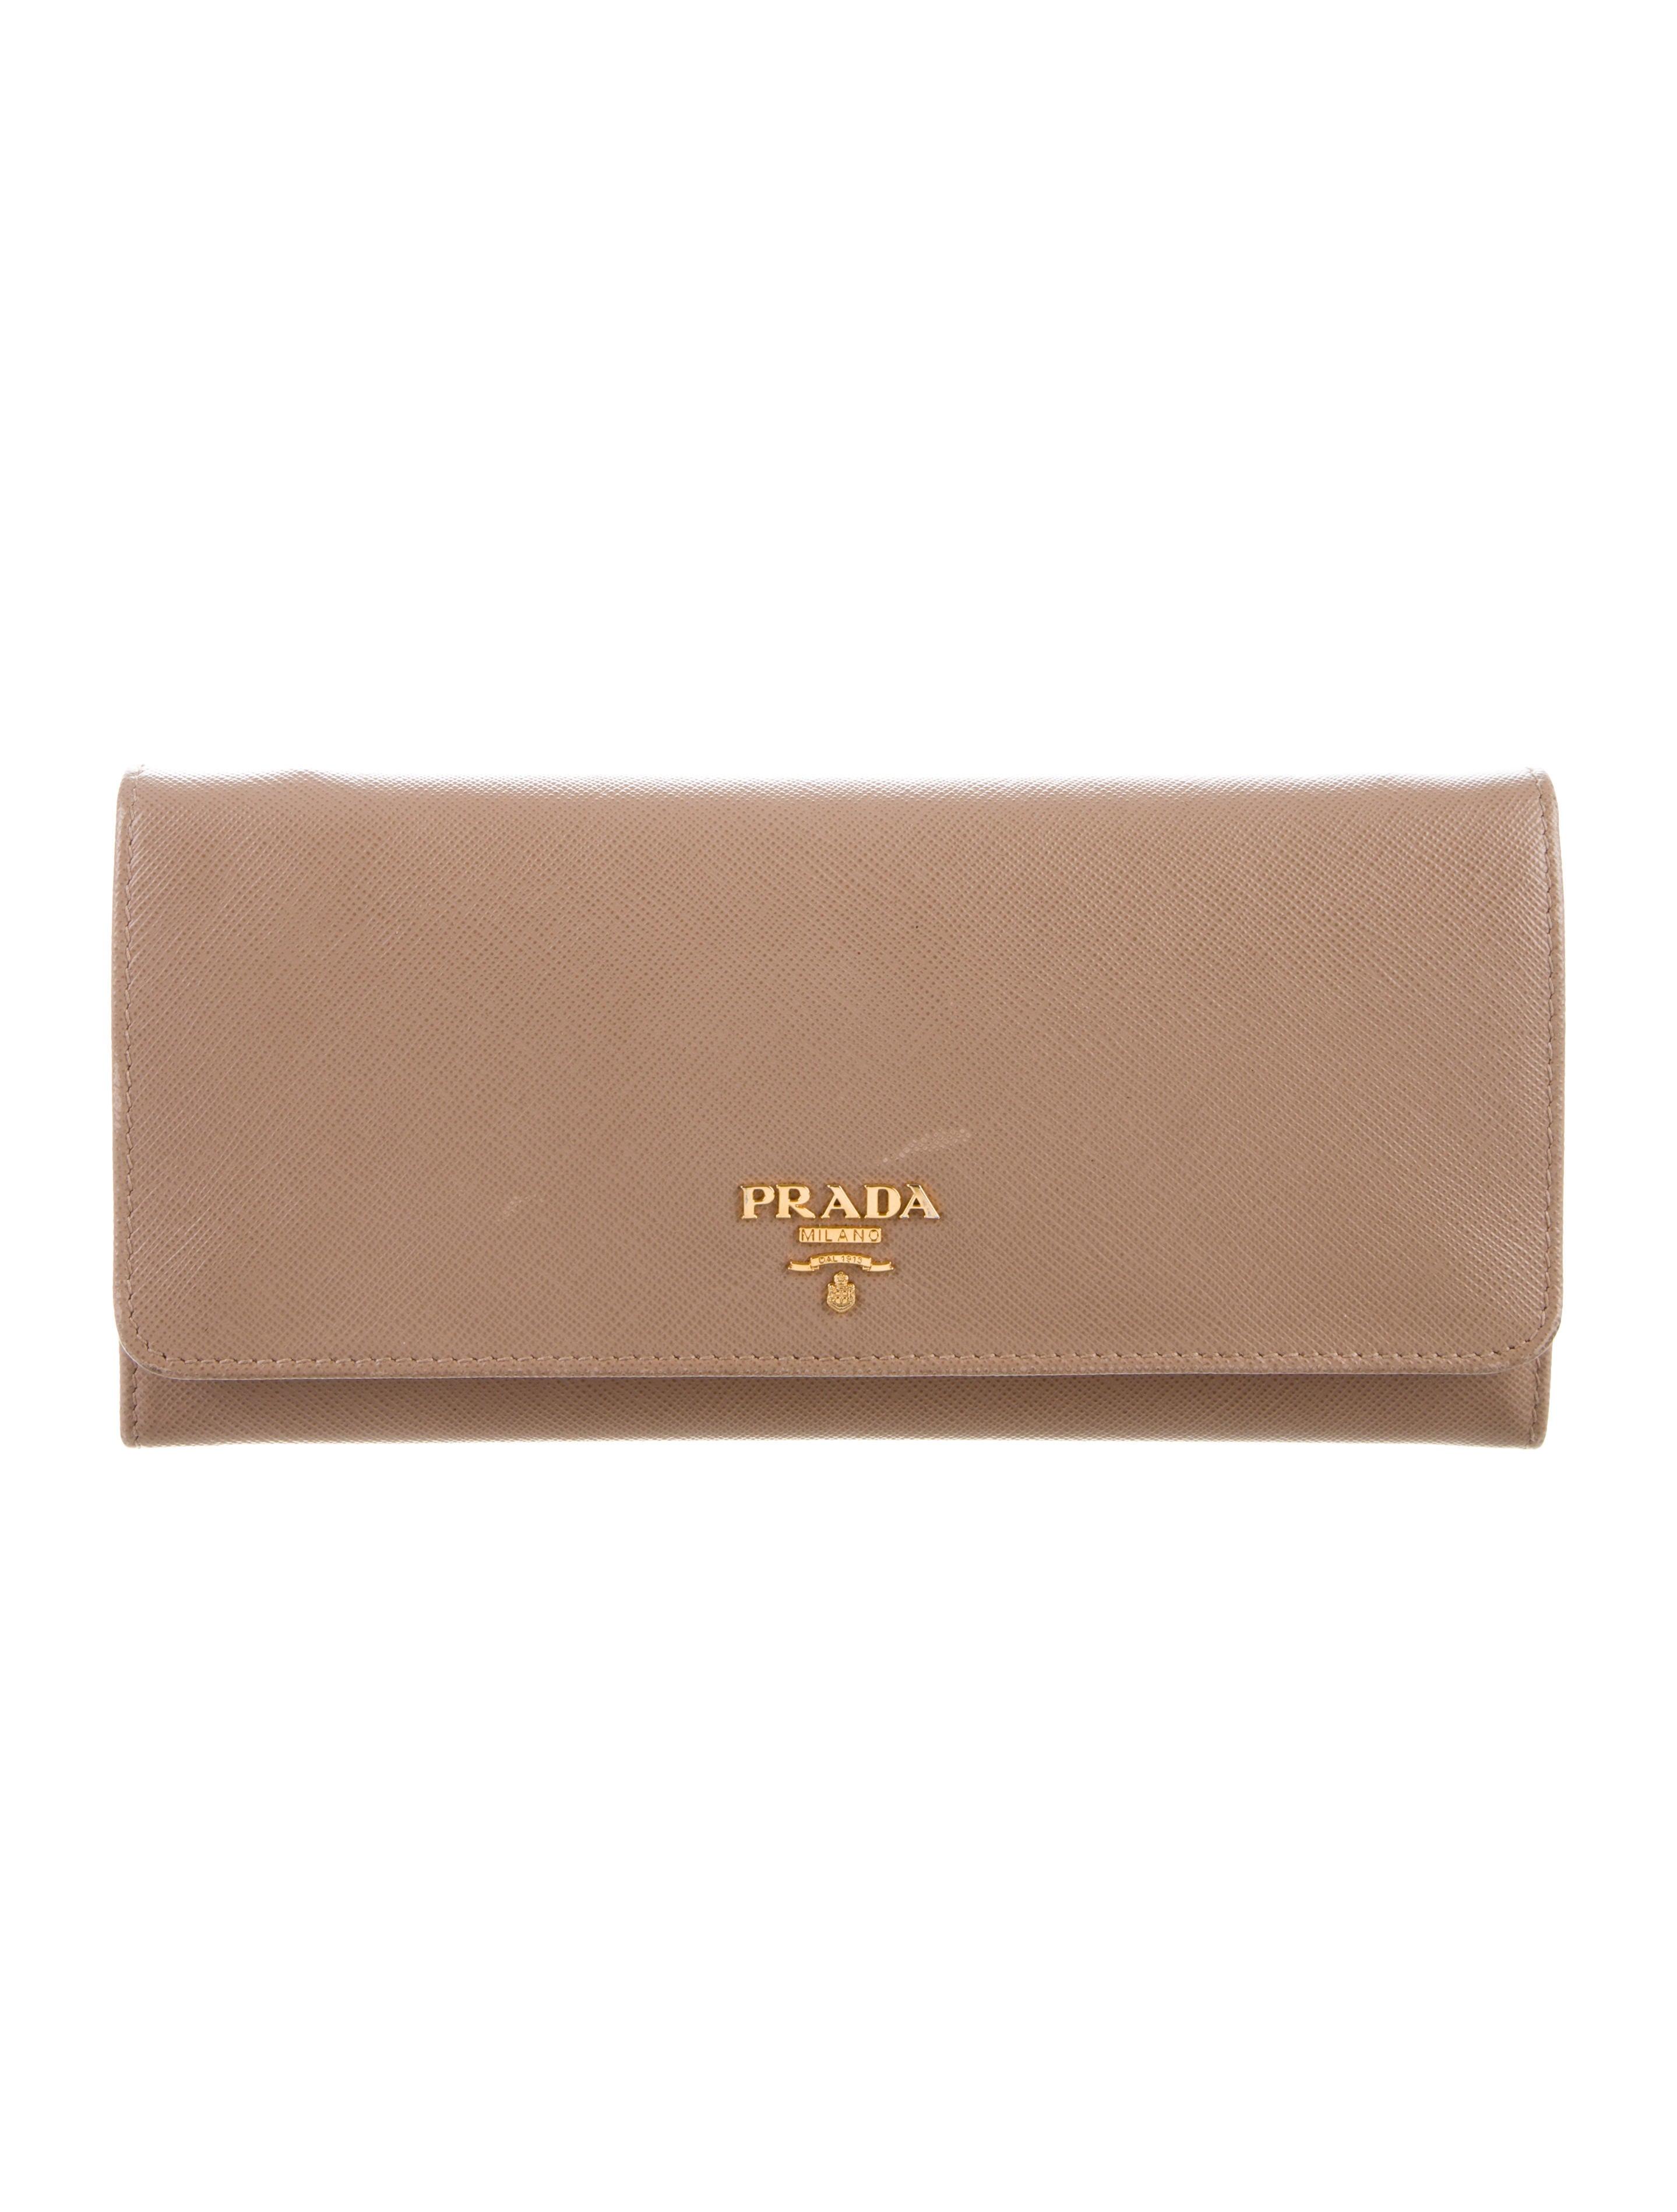 fe784037889e Prada Saffiano Leather Wallet On Chain - Handbags - PRA245149 | The ...